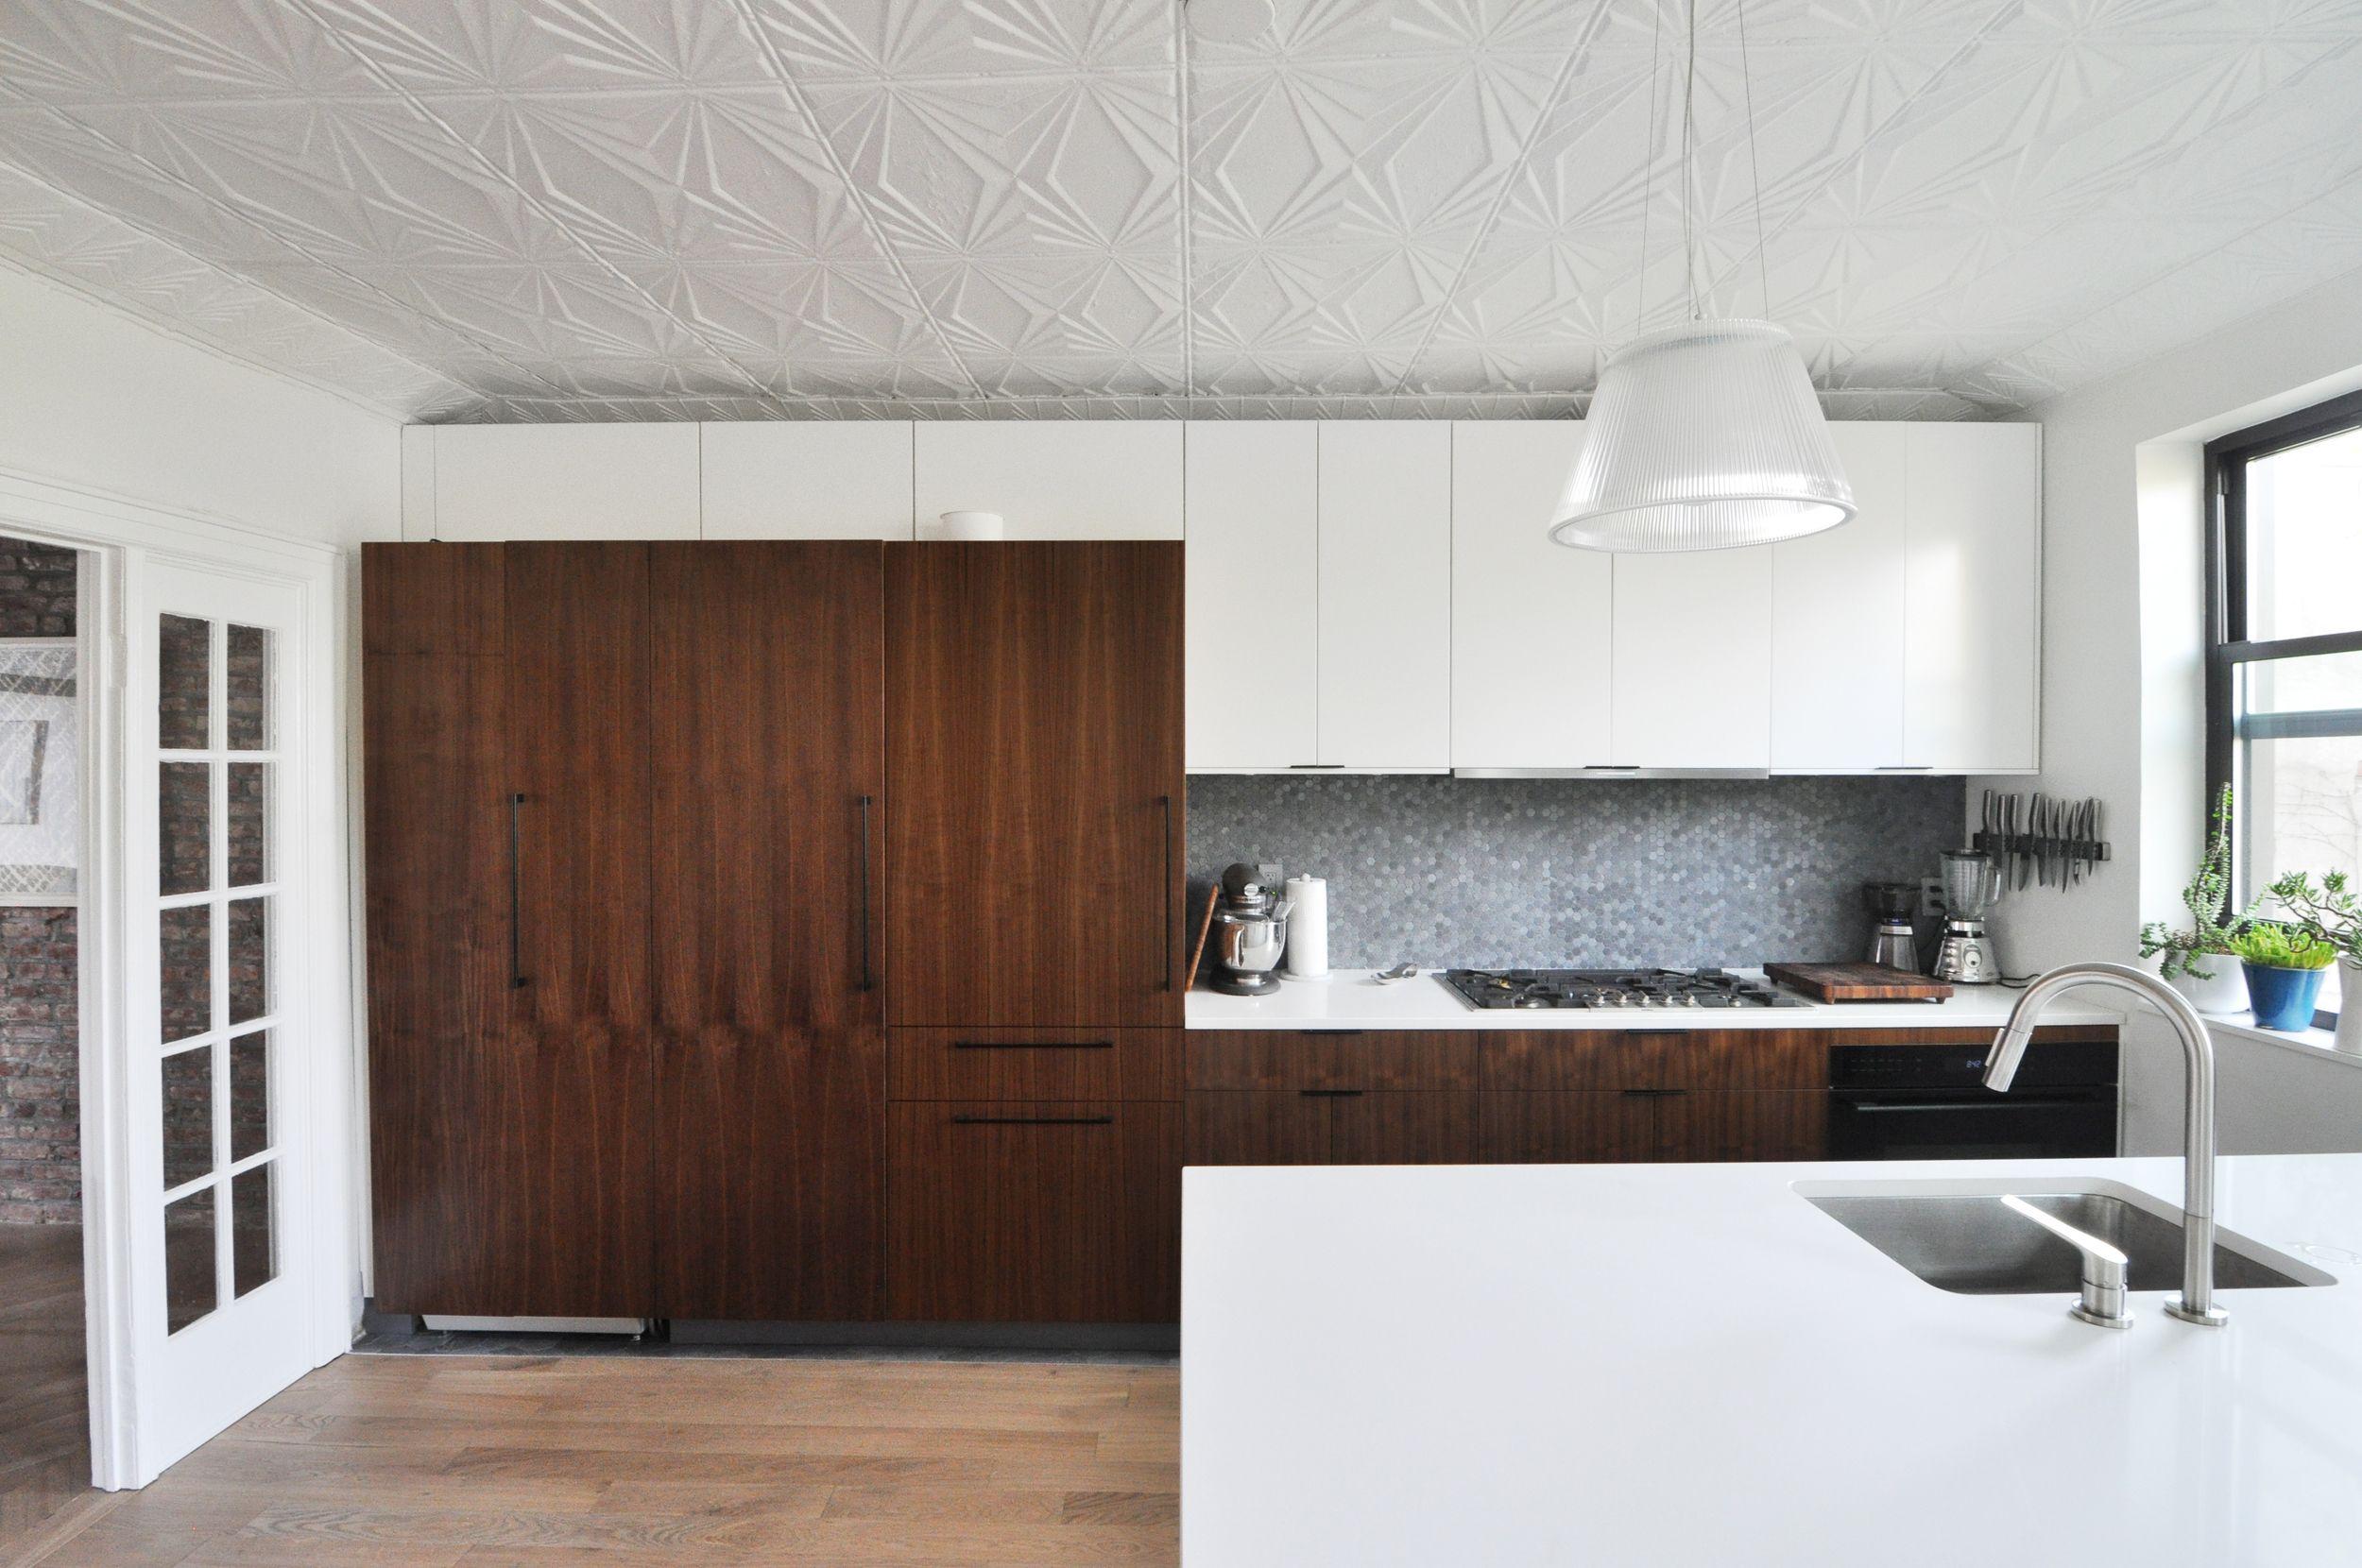 Semihandmade DIY Shaker Ikea Kitchen Cost of kitchen